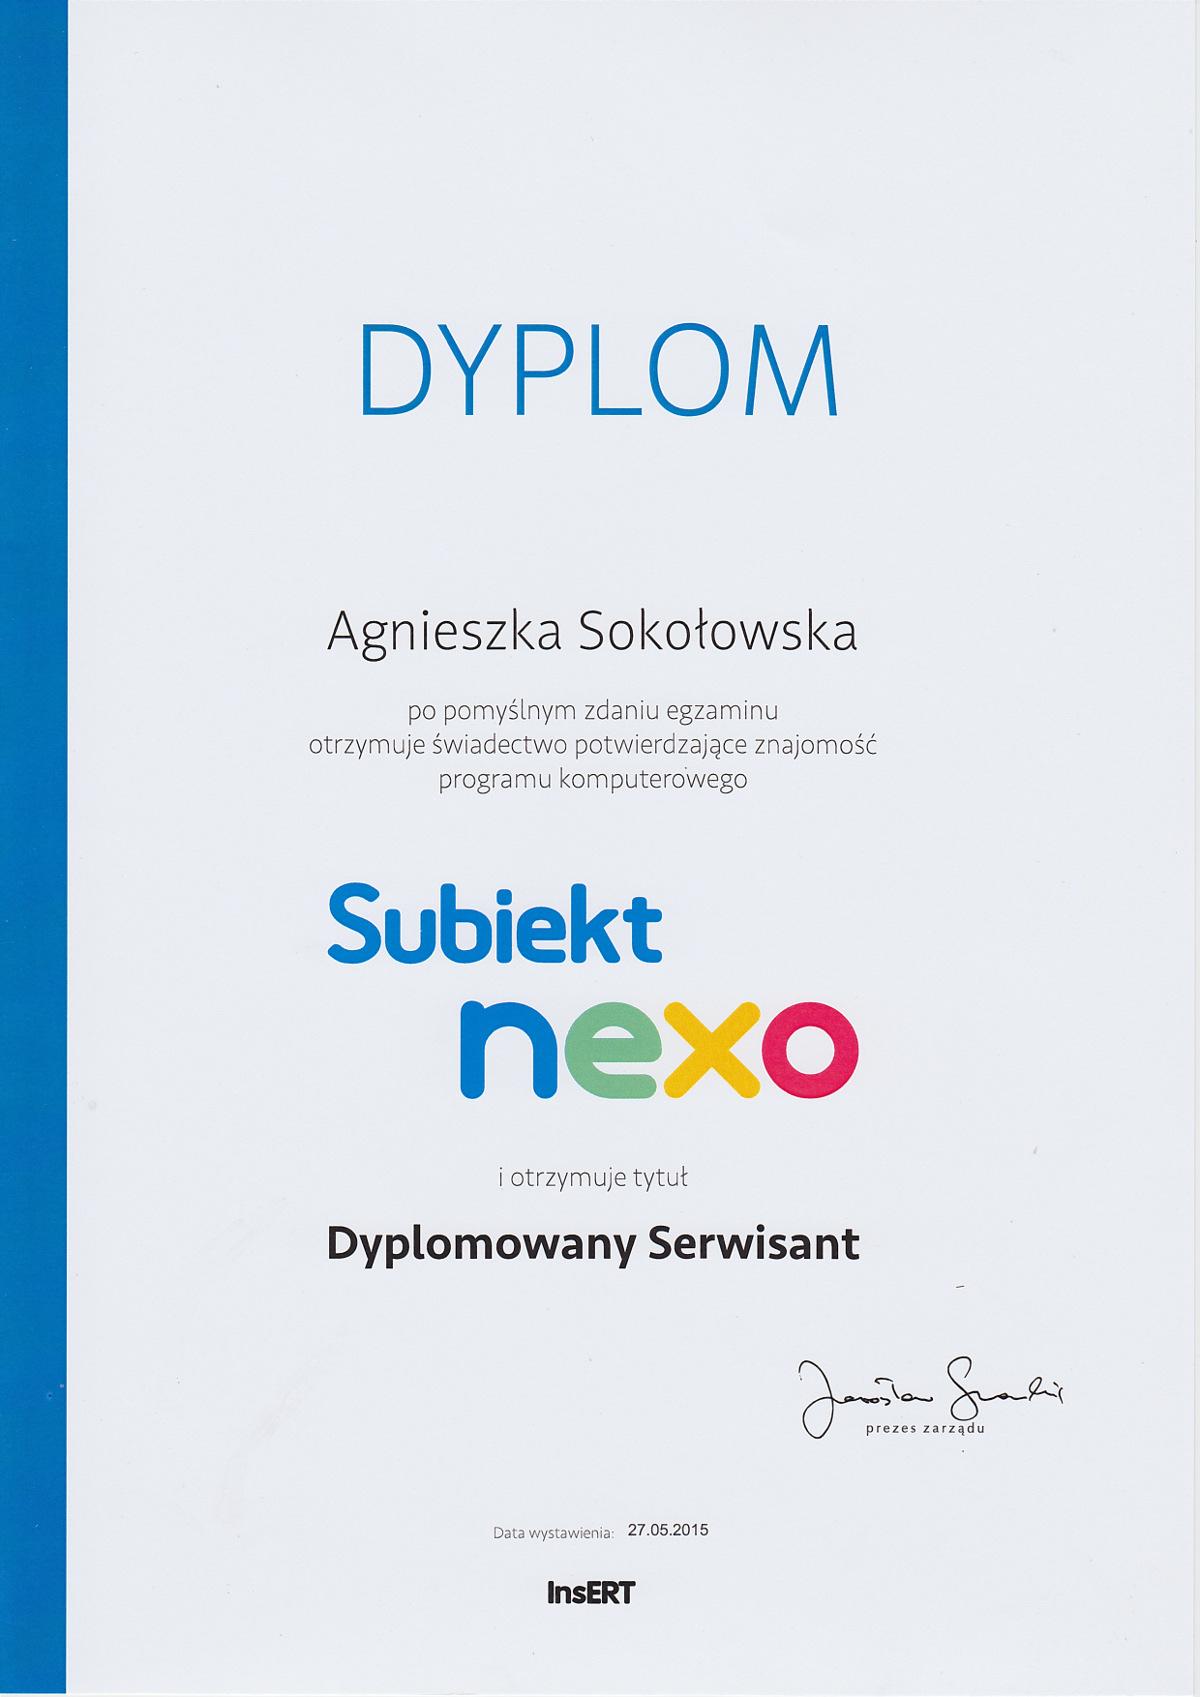 Dyplom Subiekt NEXO - Agnieszka Sokołowska